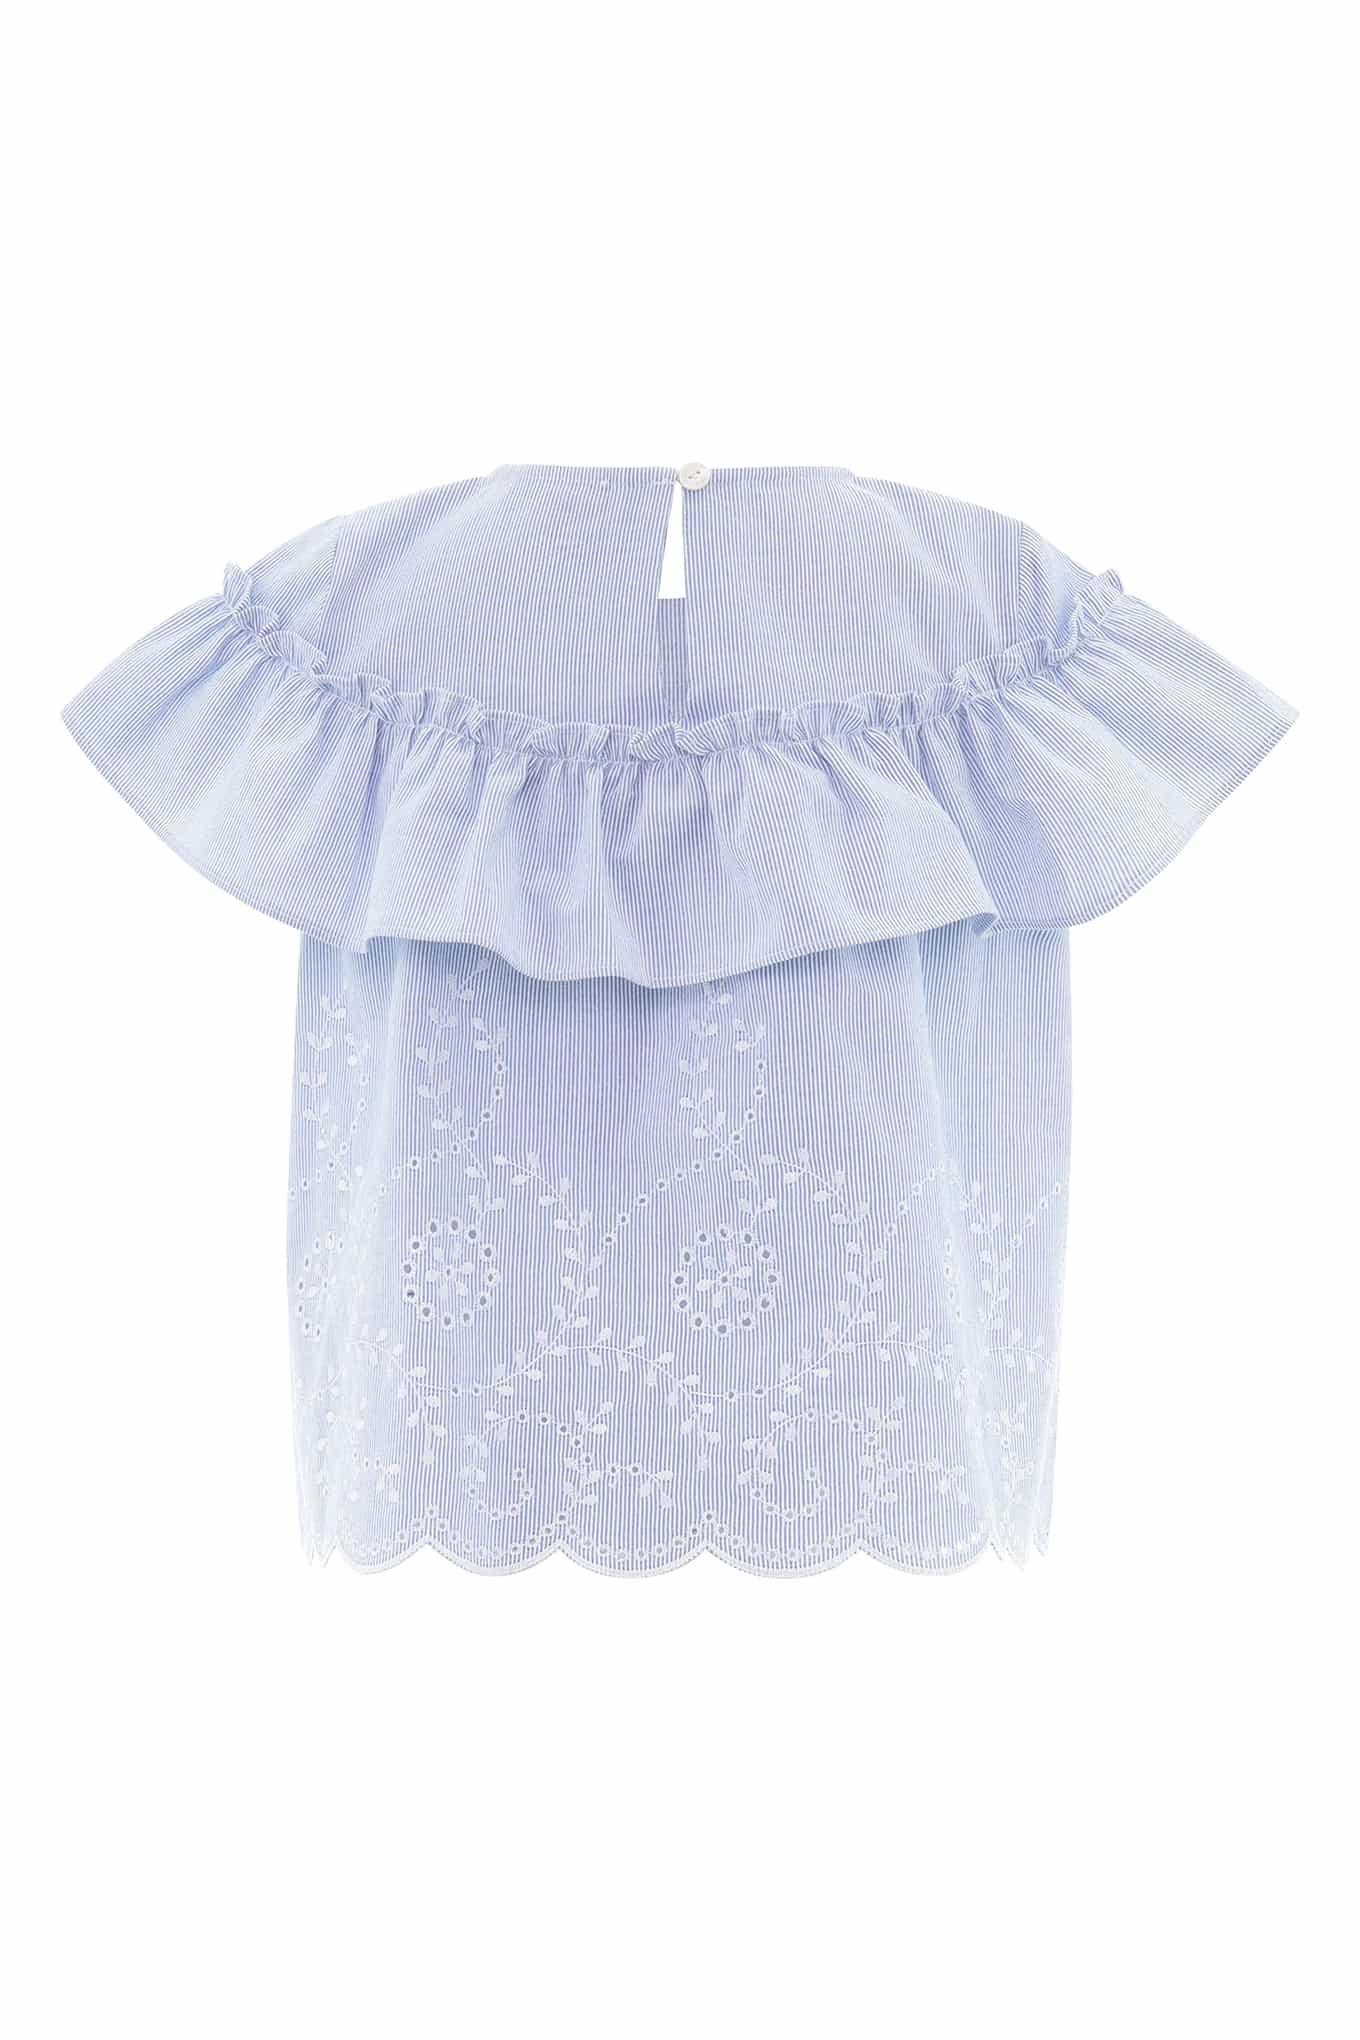 Blusa Azul Claro Casual Rapariga